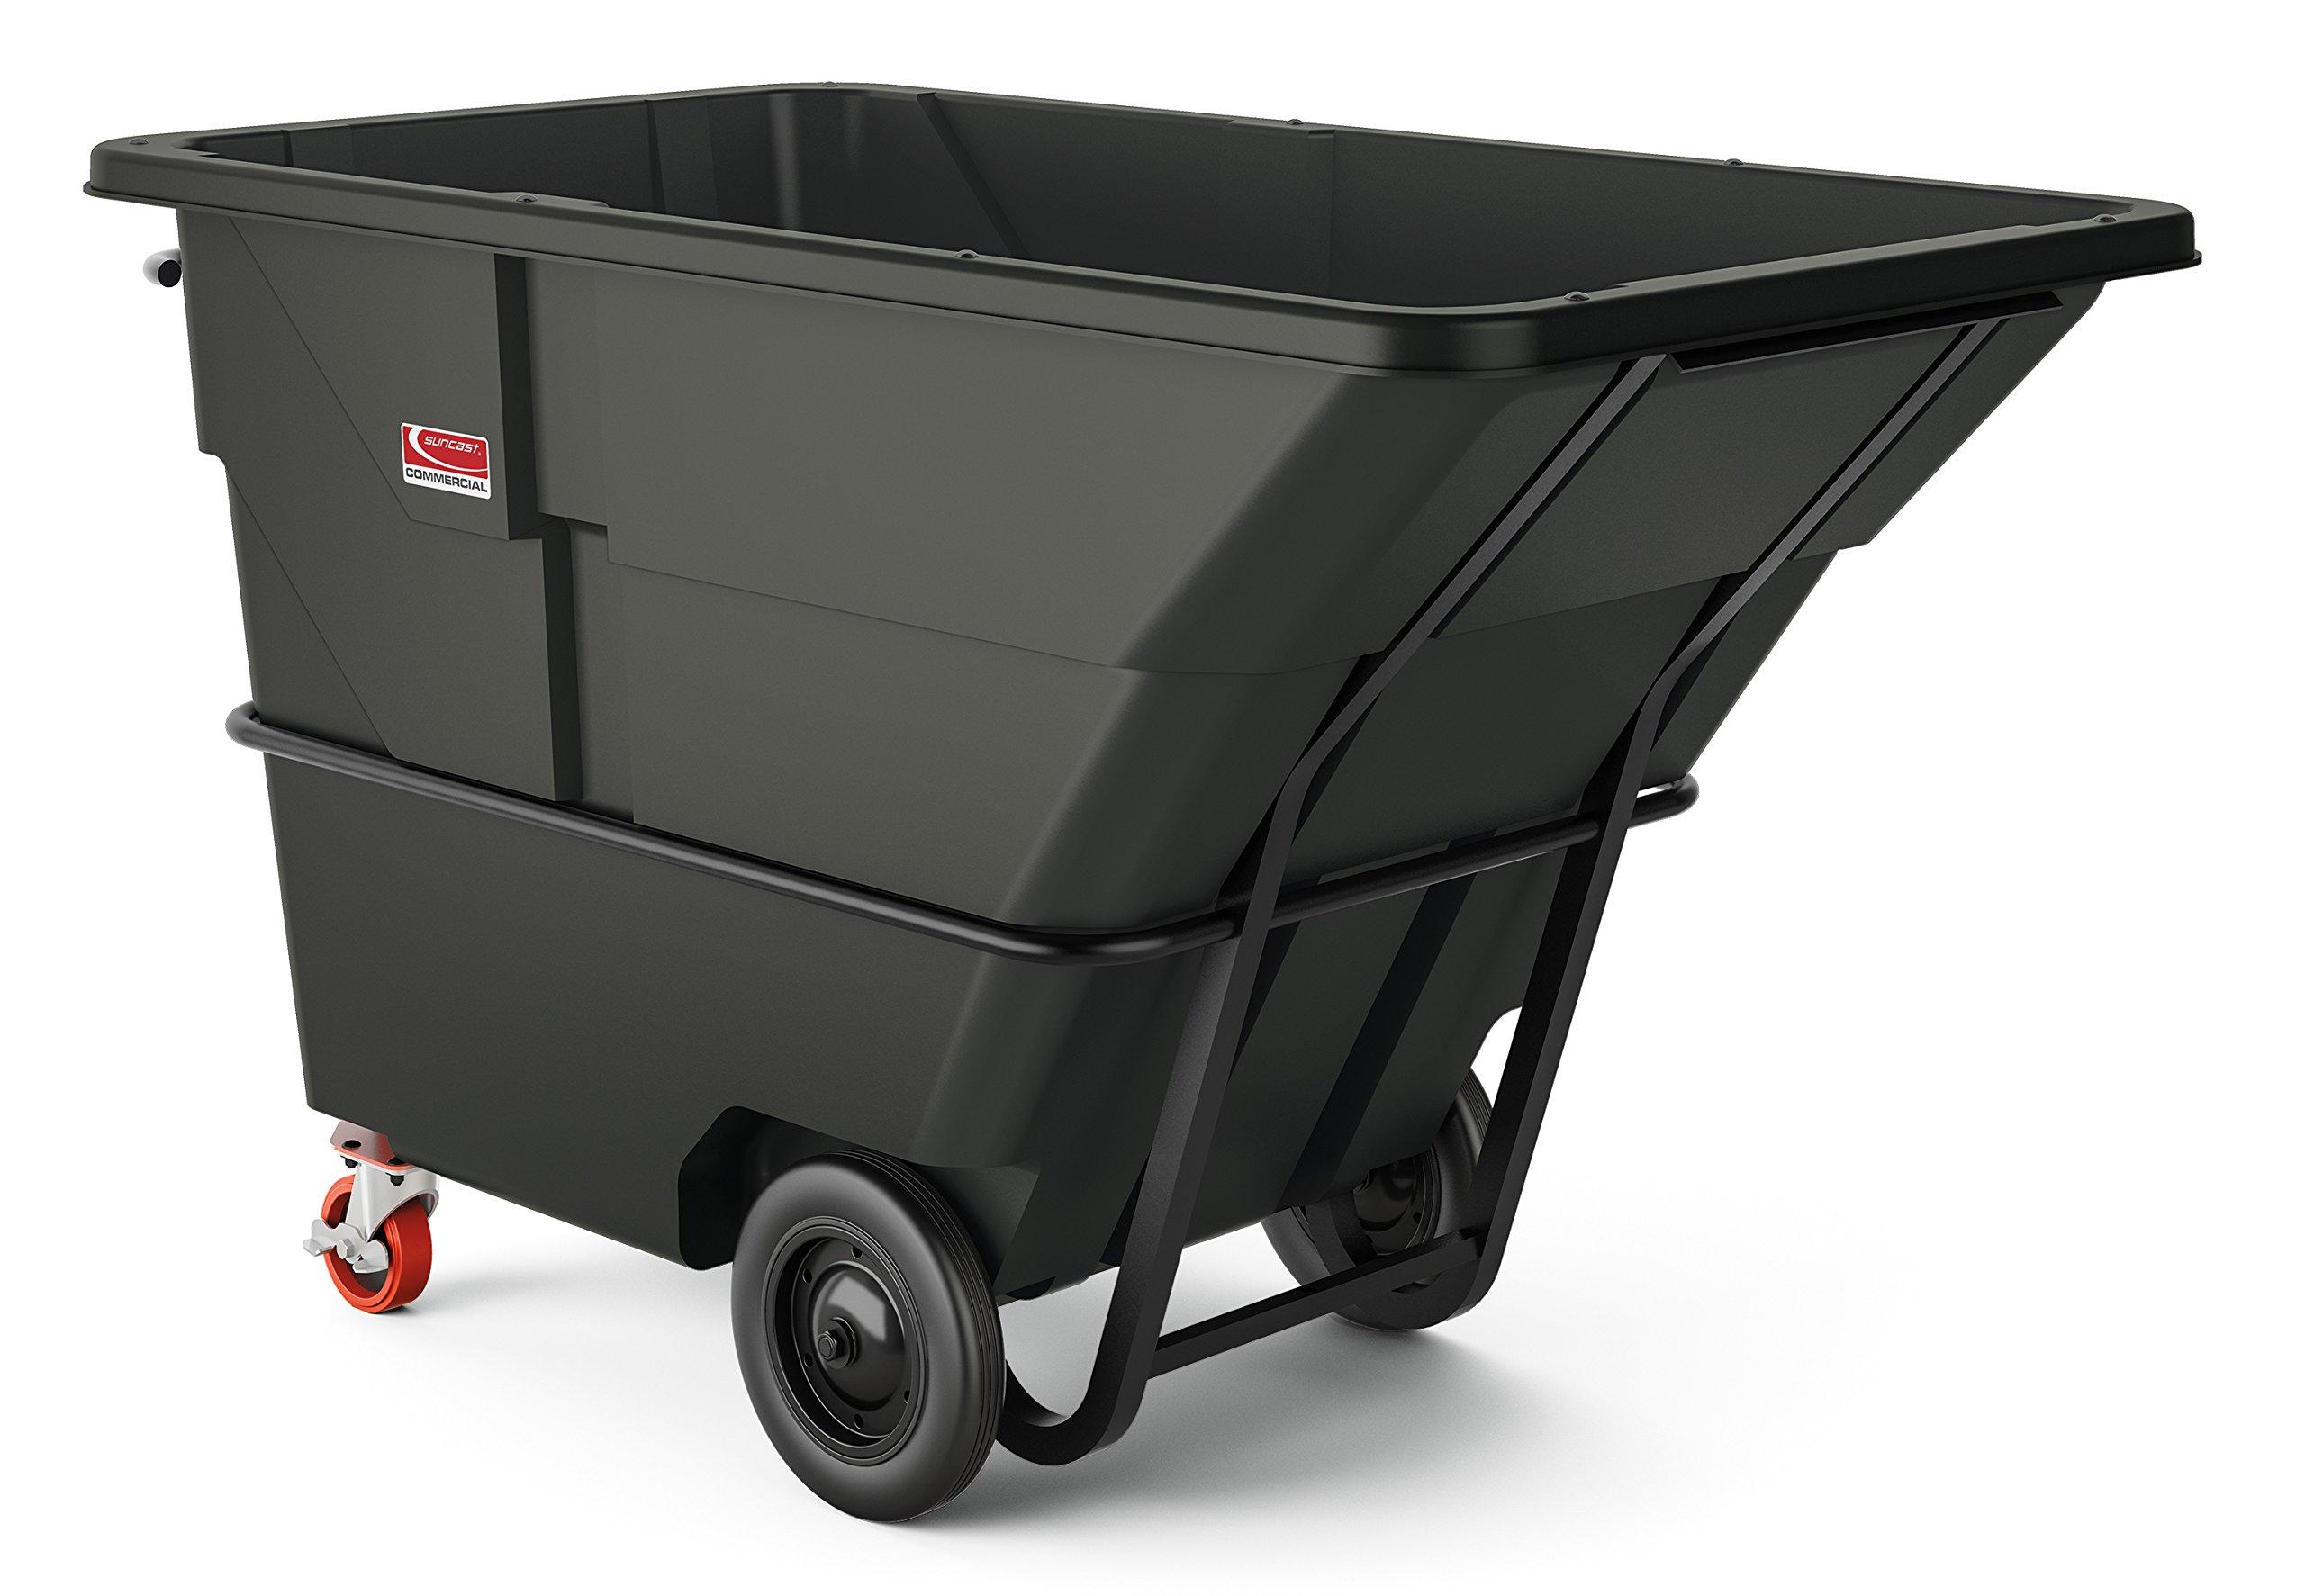 Suncast Commercial RMTTHD200 2 Cubic Yard Heavy Duty Tilt Truck, Gray